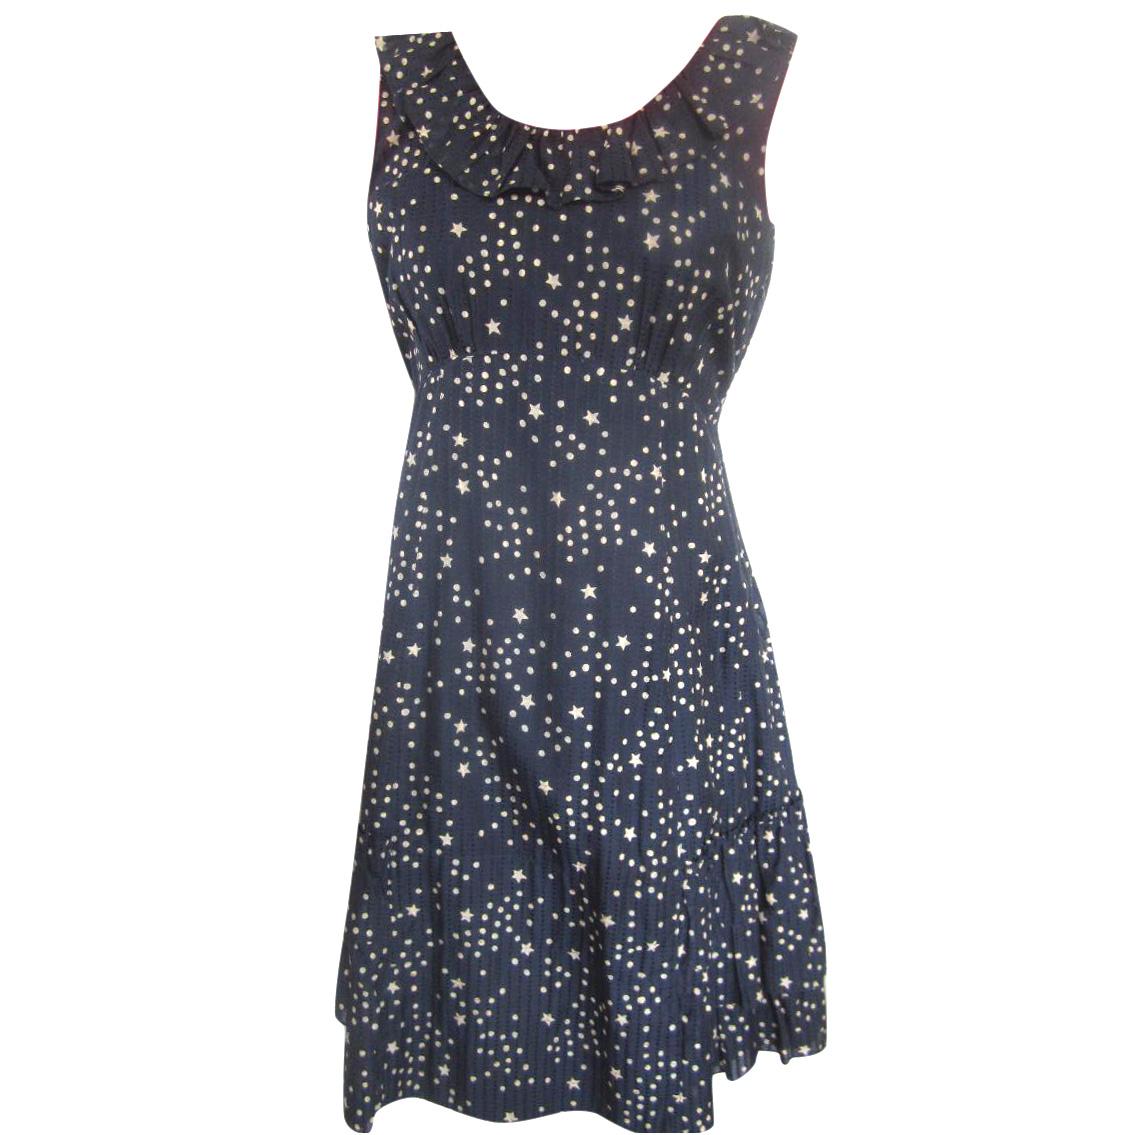 Marc by Marc Jacobs Blue White Star Print Ruffle Detail Dress